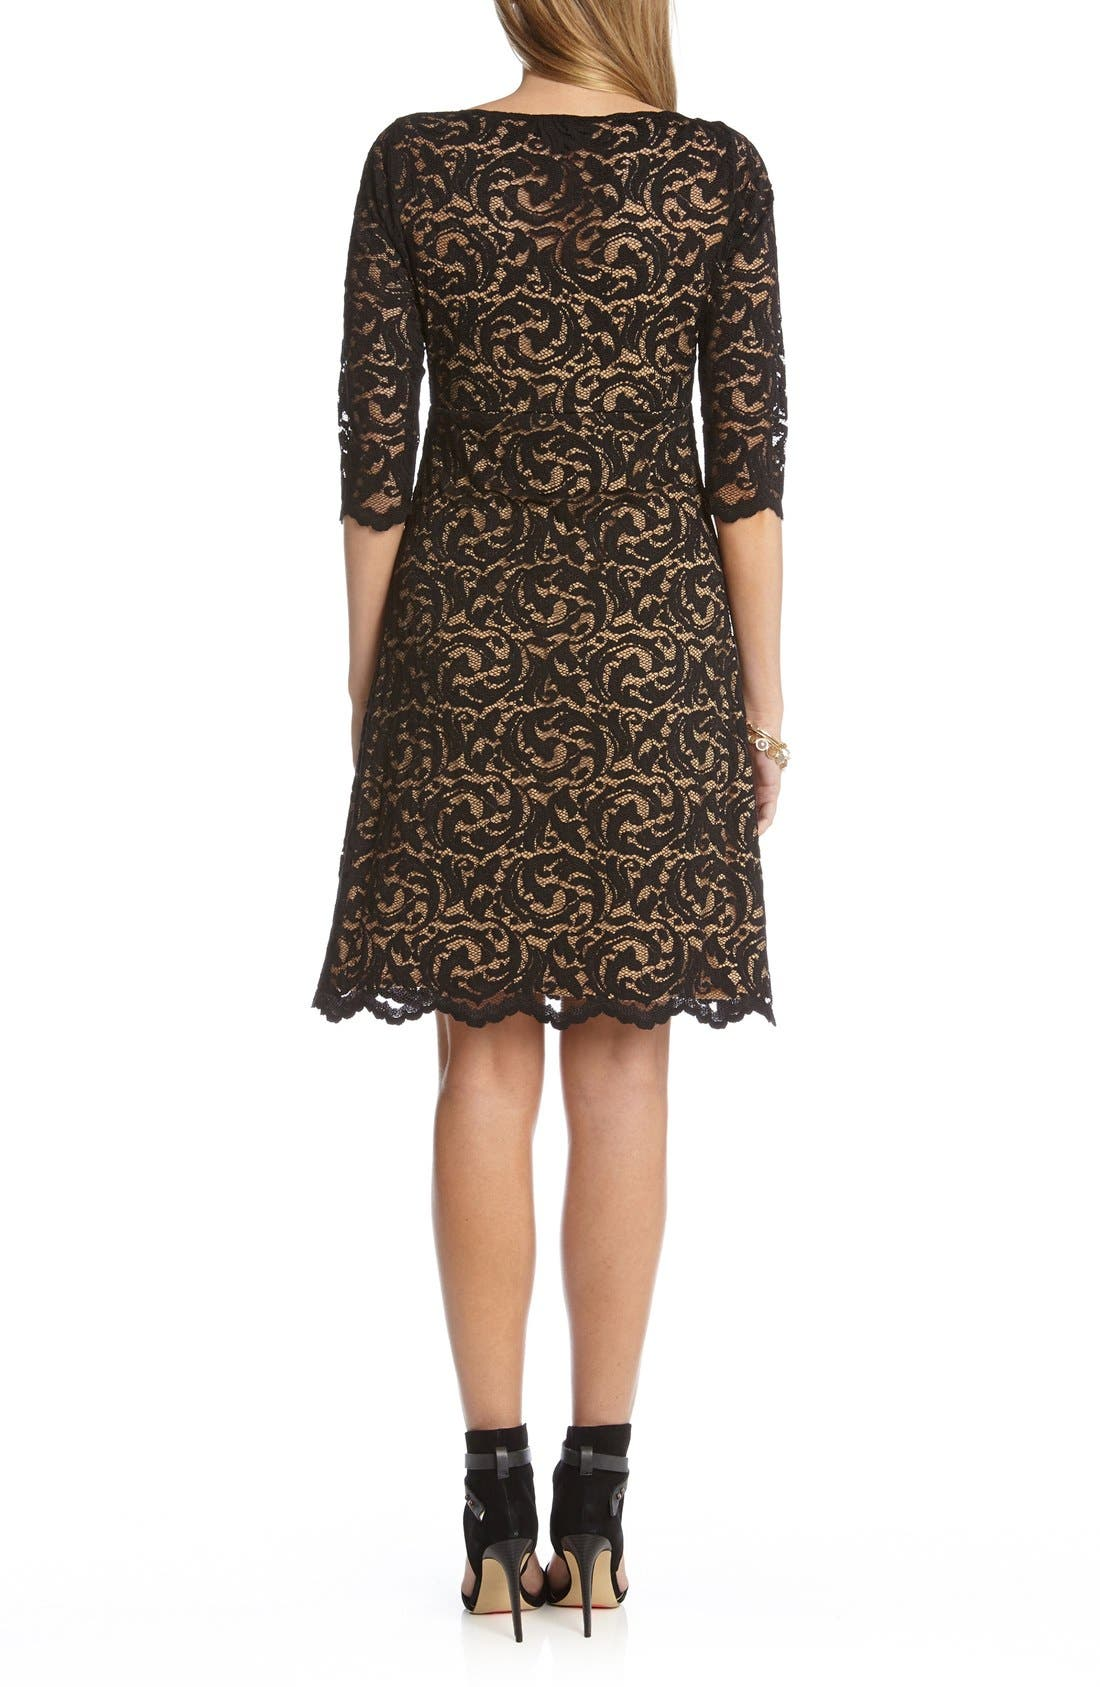 Scalloped Lace V-Neck Dress,                             Alternate thumbnail 2, color,                             Black/ Nude